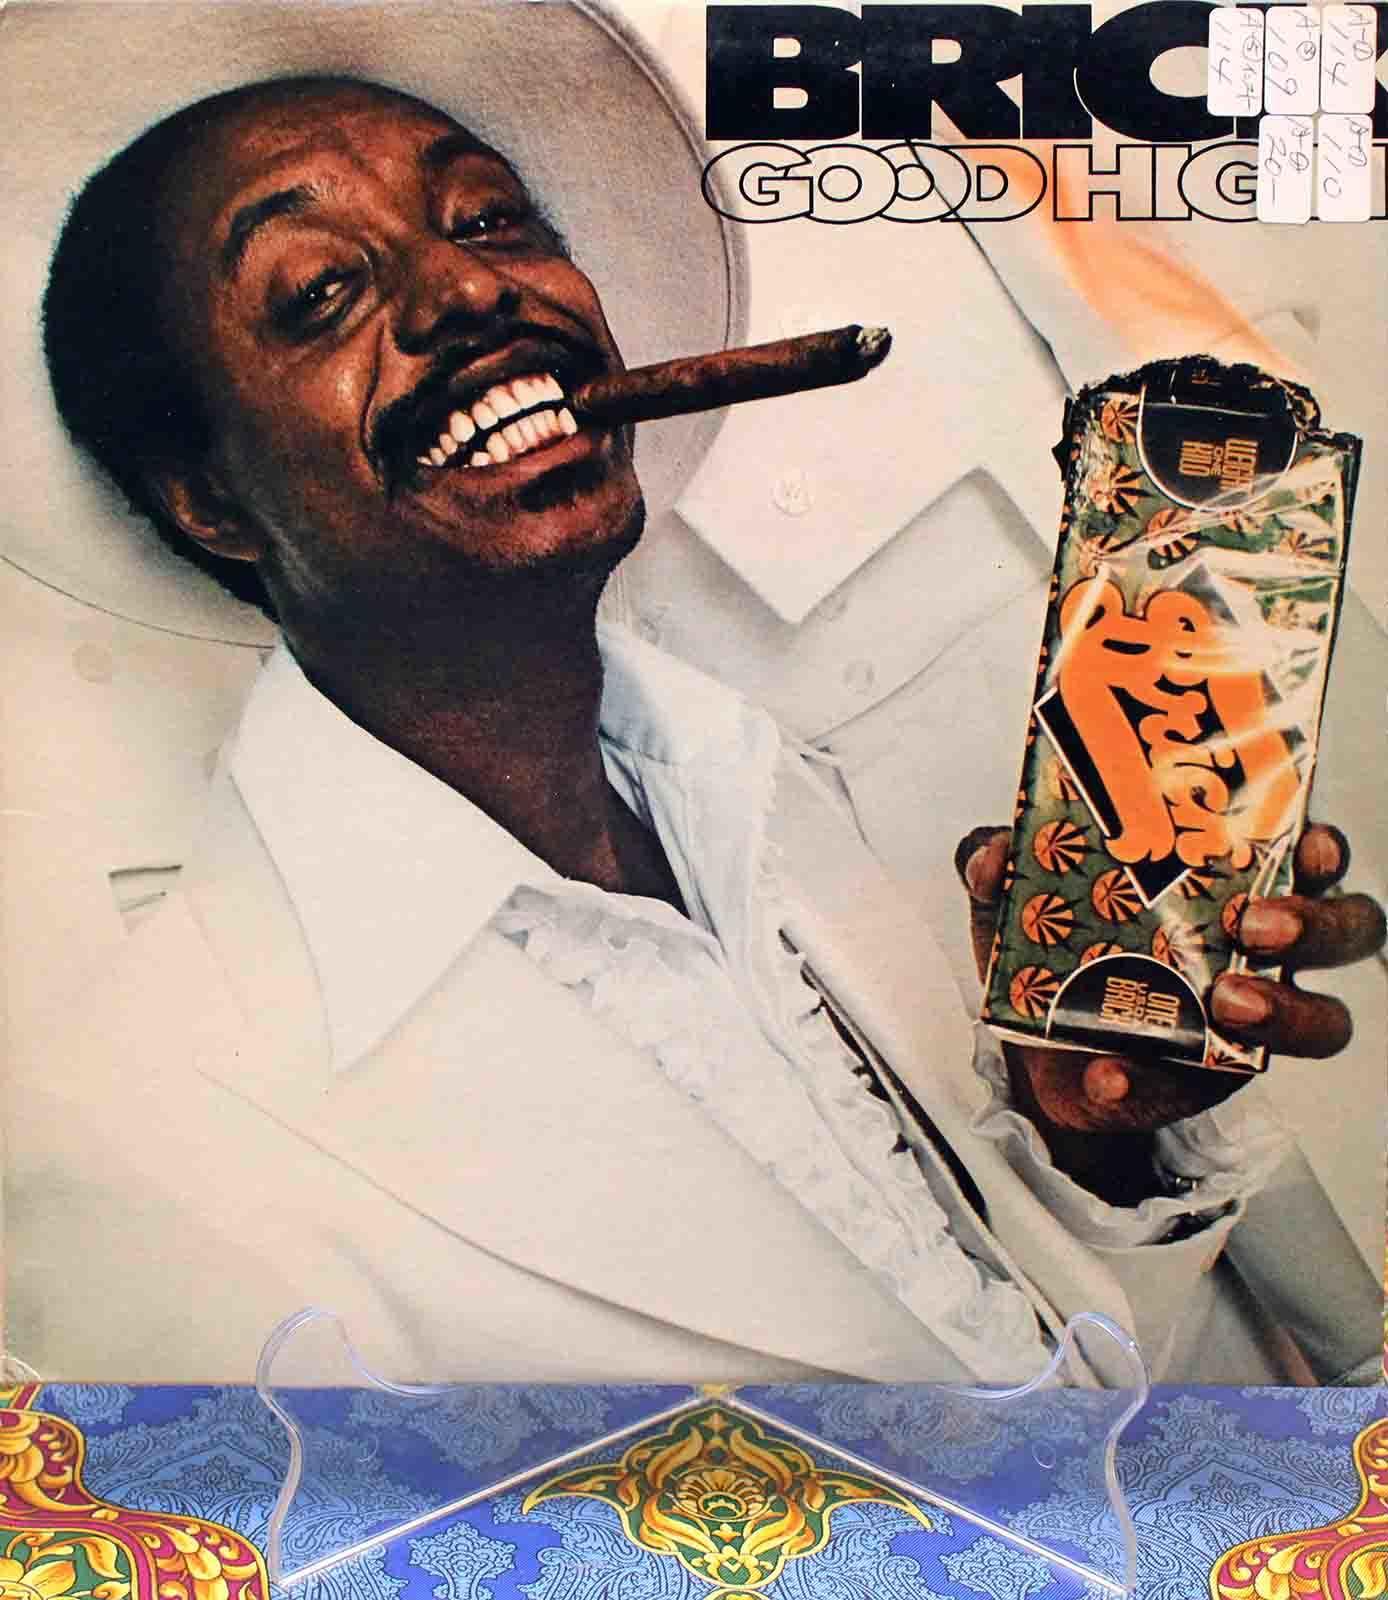 Brick Good High LP 01